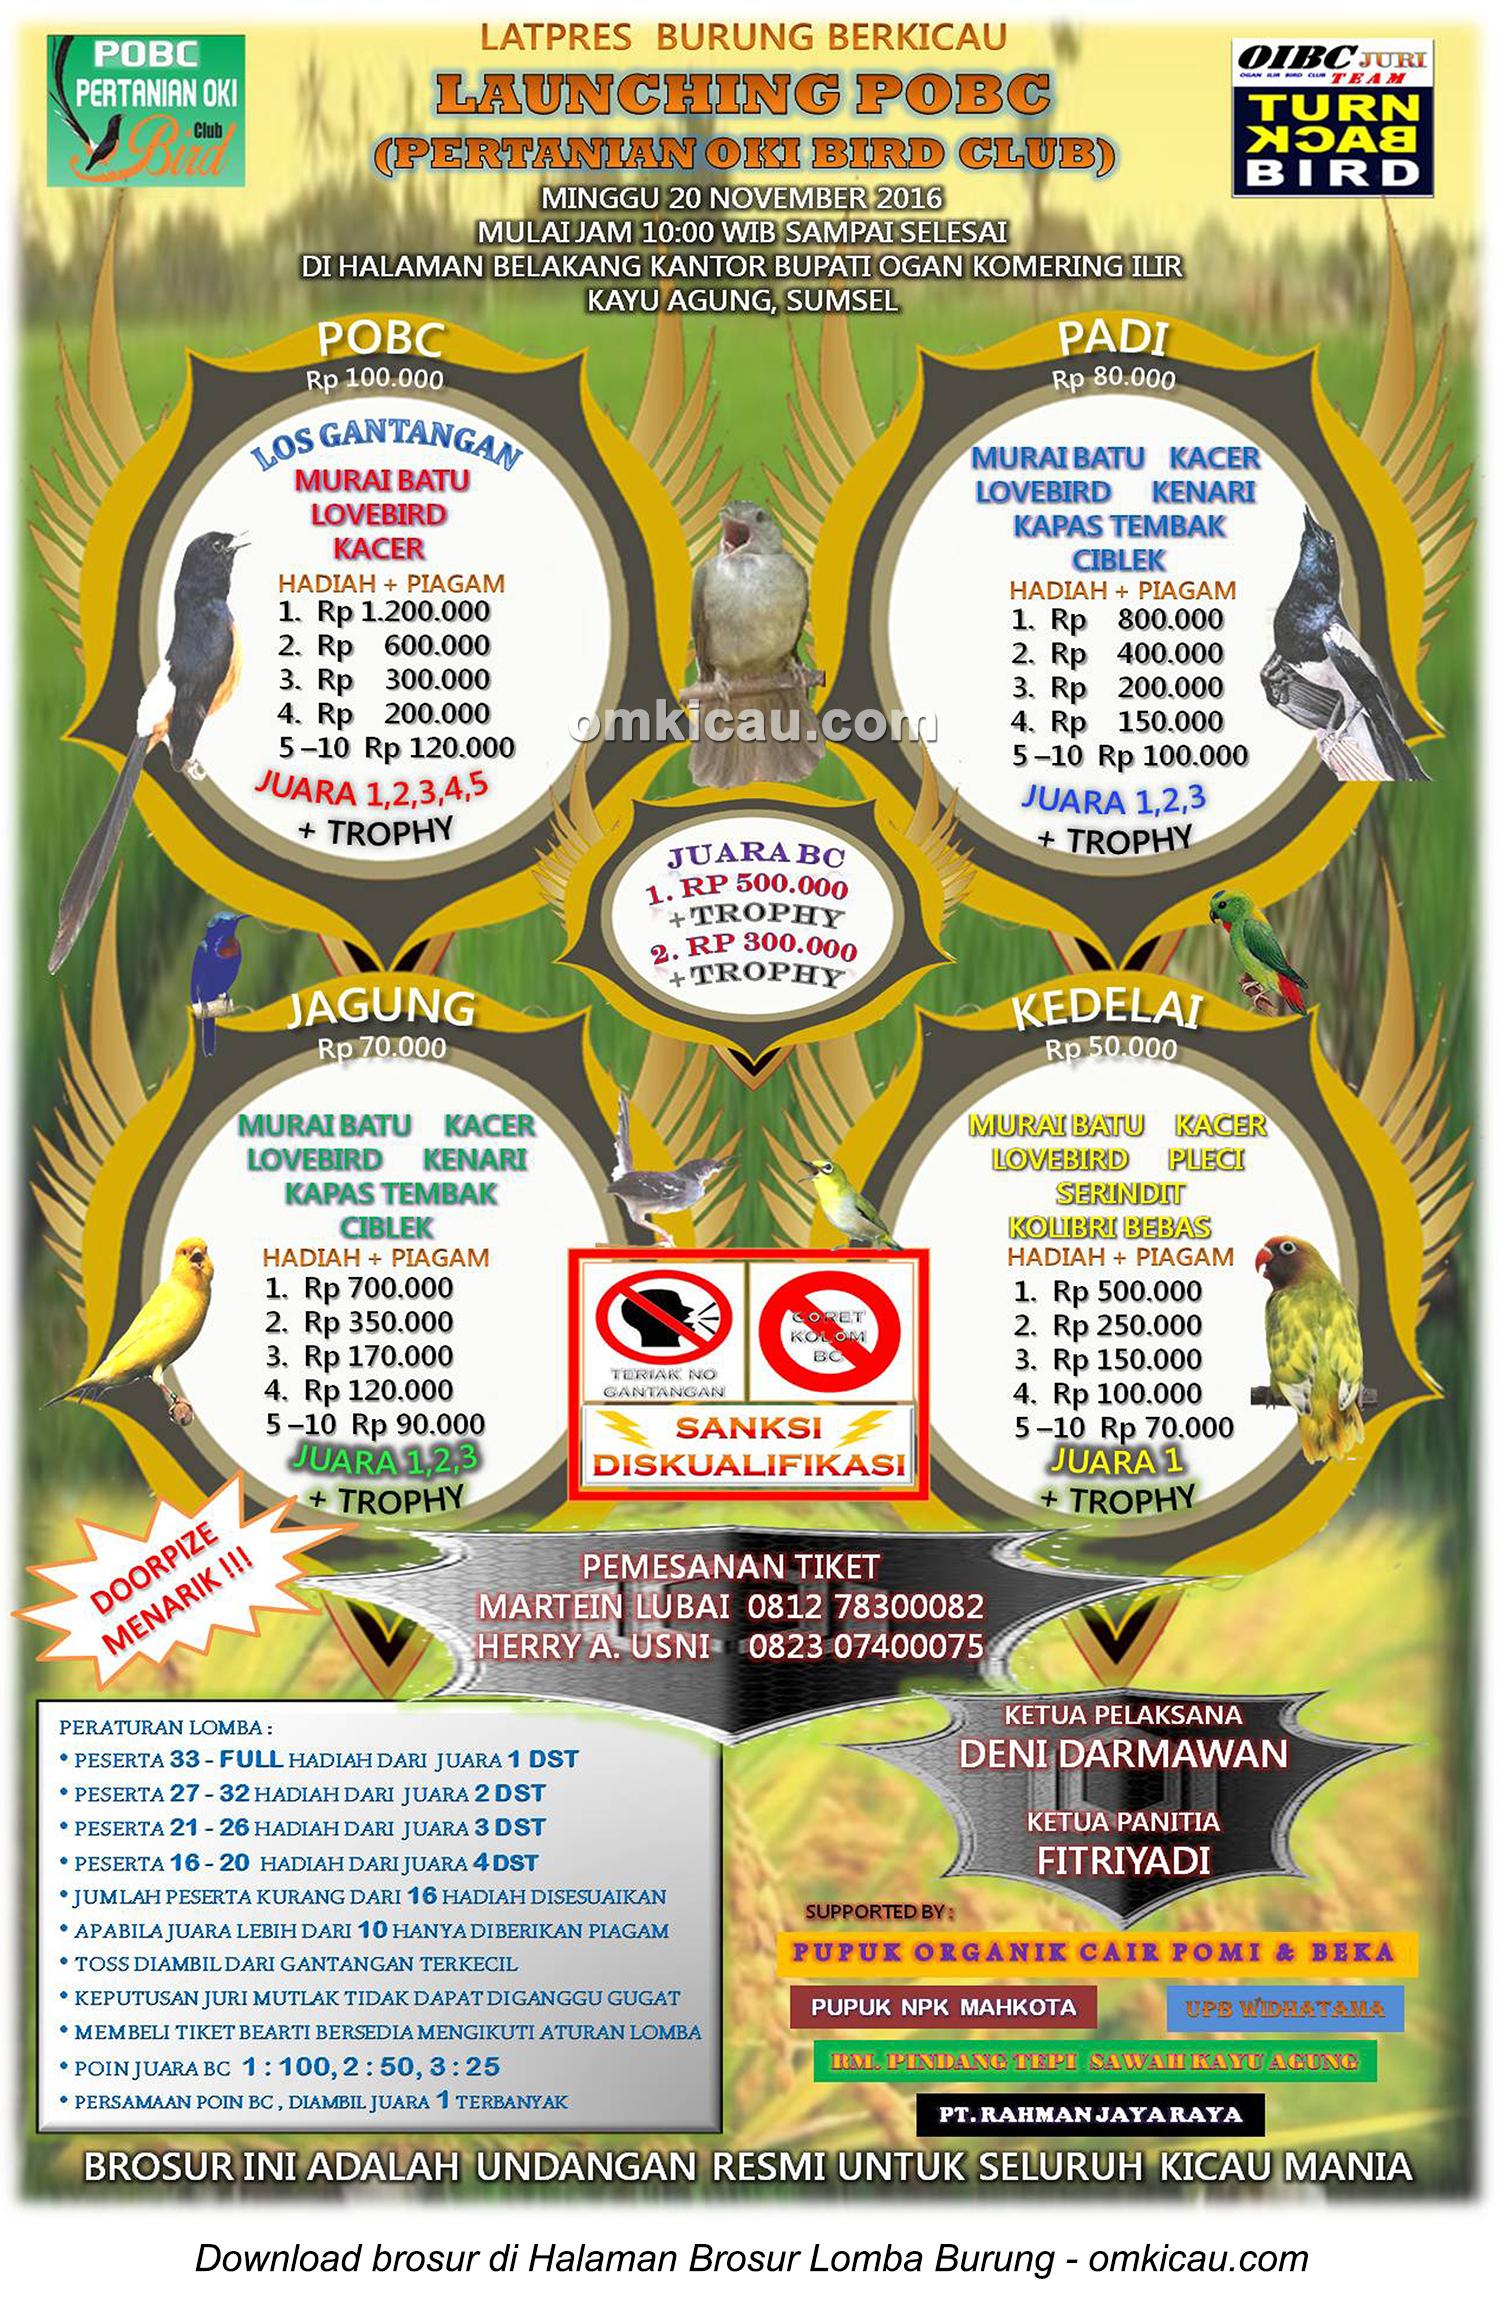 Brosur Latpres Burung Berkicau Launching POBC, OKI, 20 November 2016